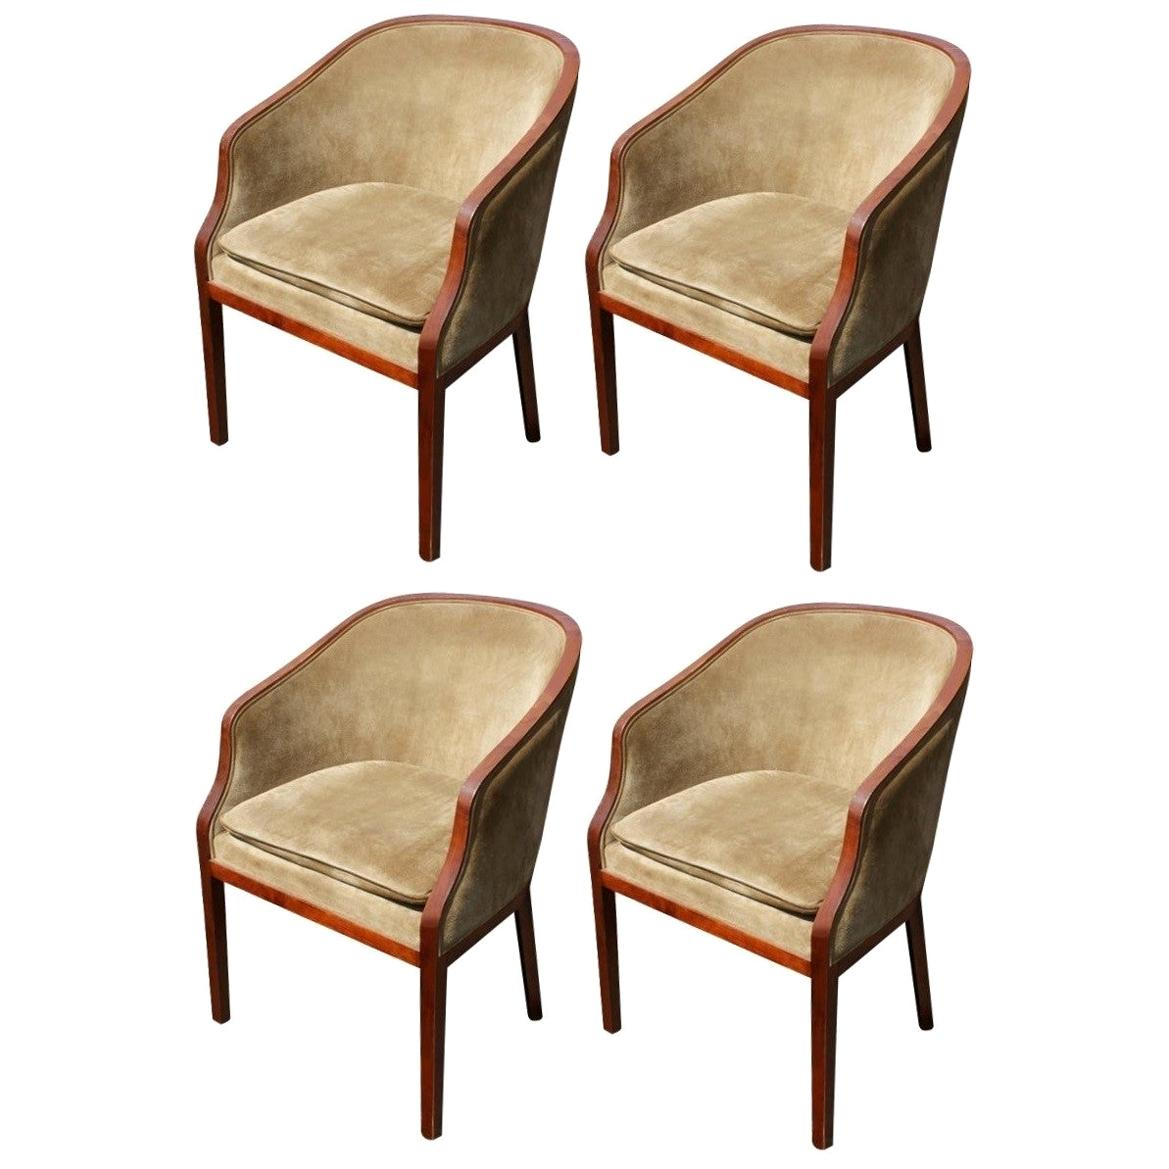 Charming Set of Four Suede Ward Bennett Brickel Armchairs